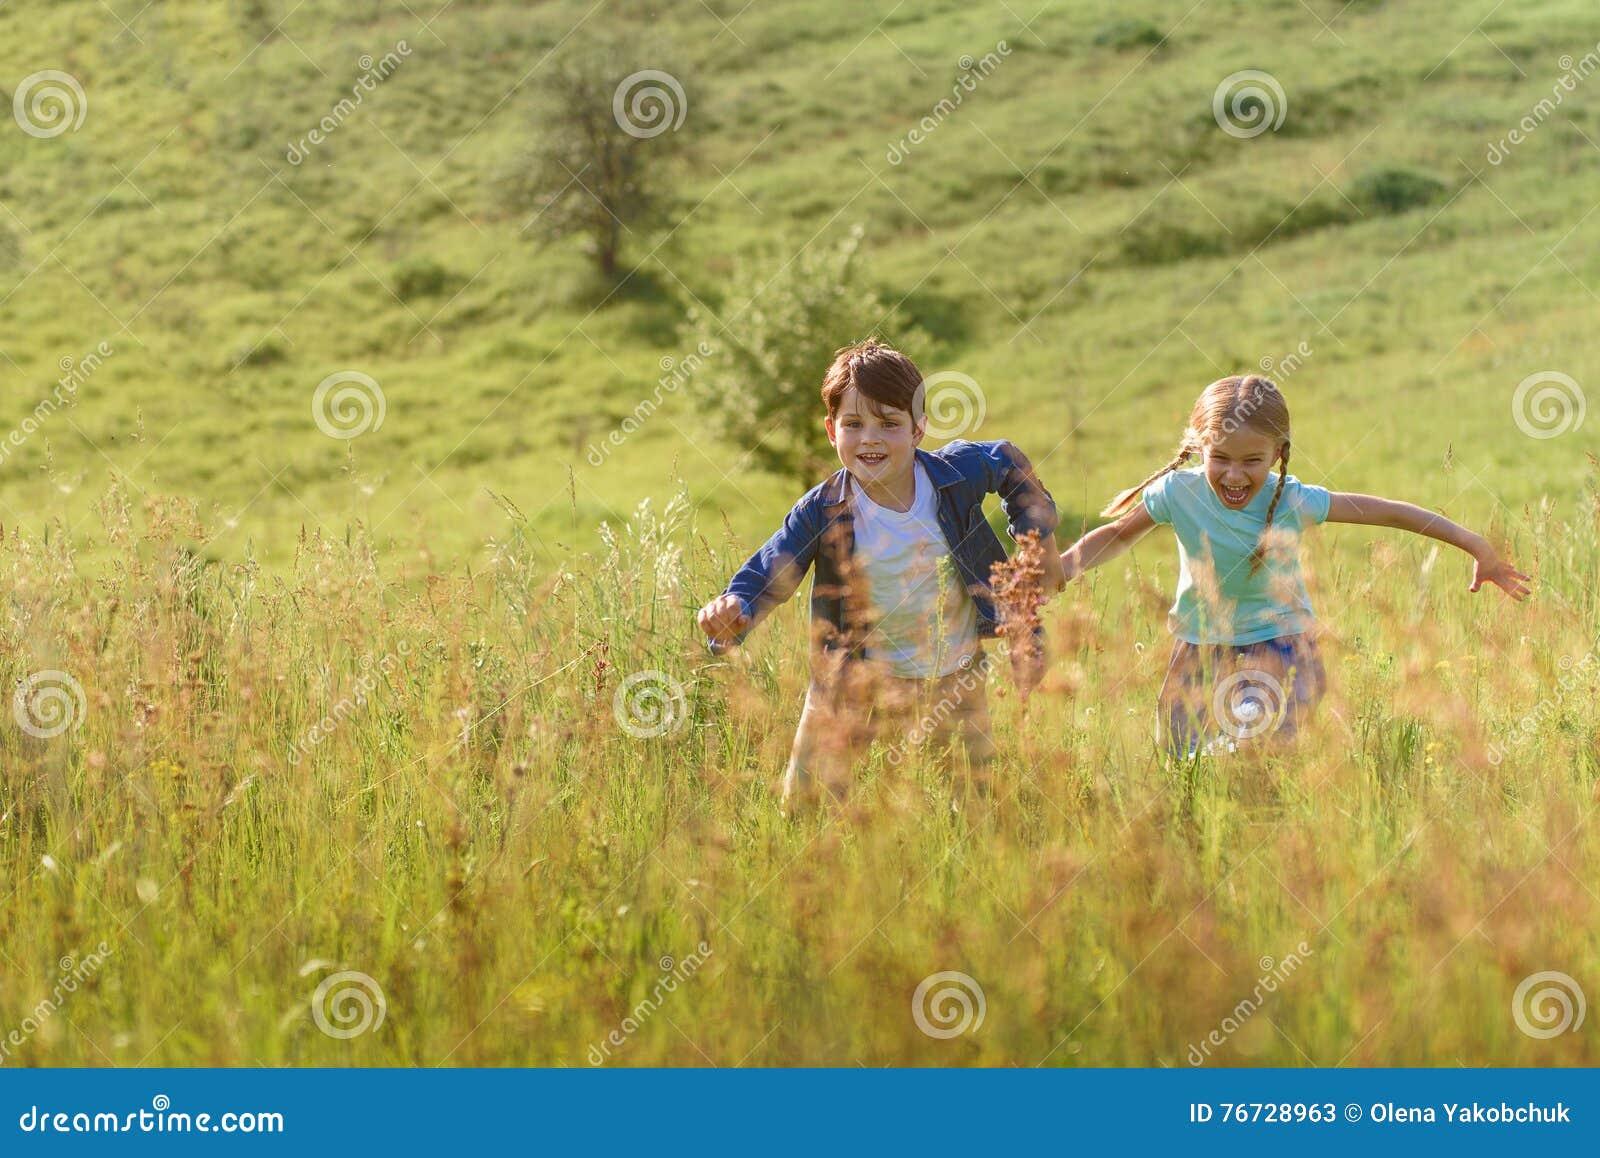 Girl Running In Field